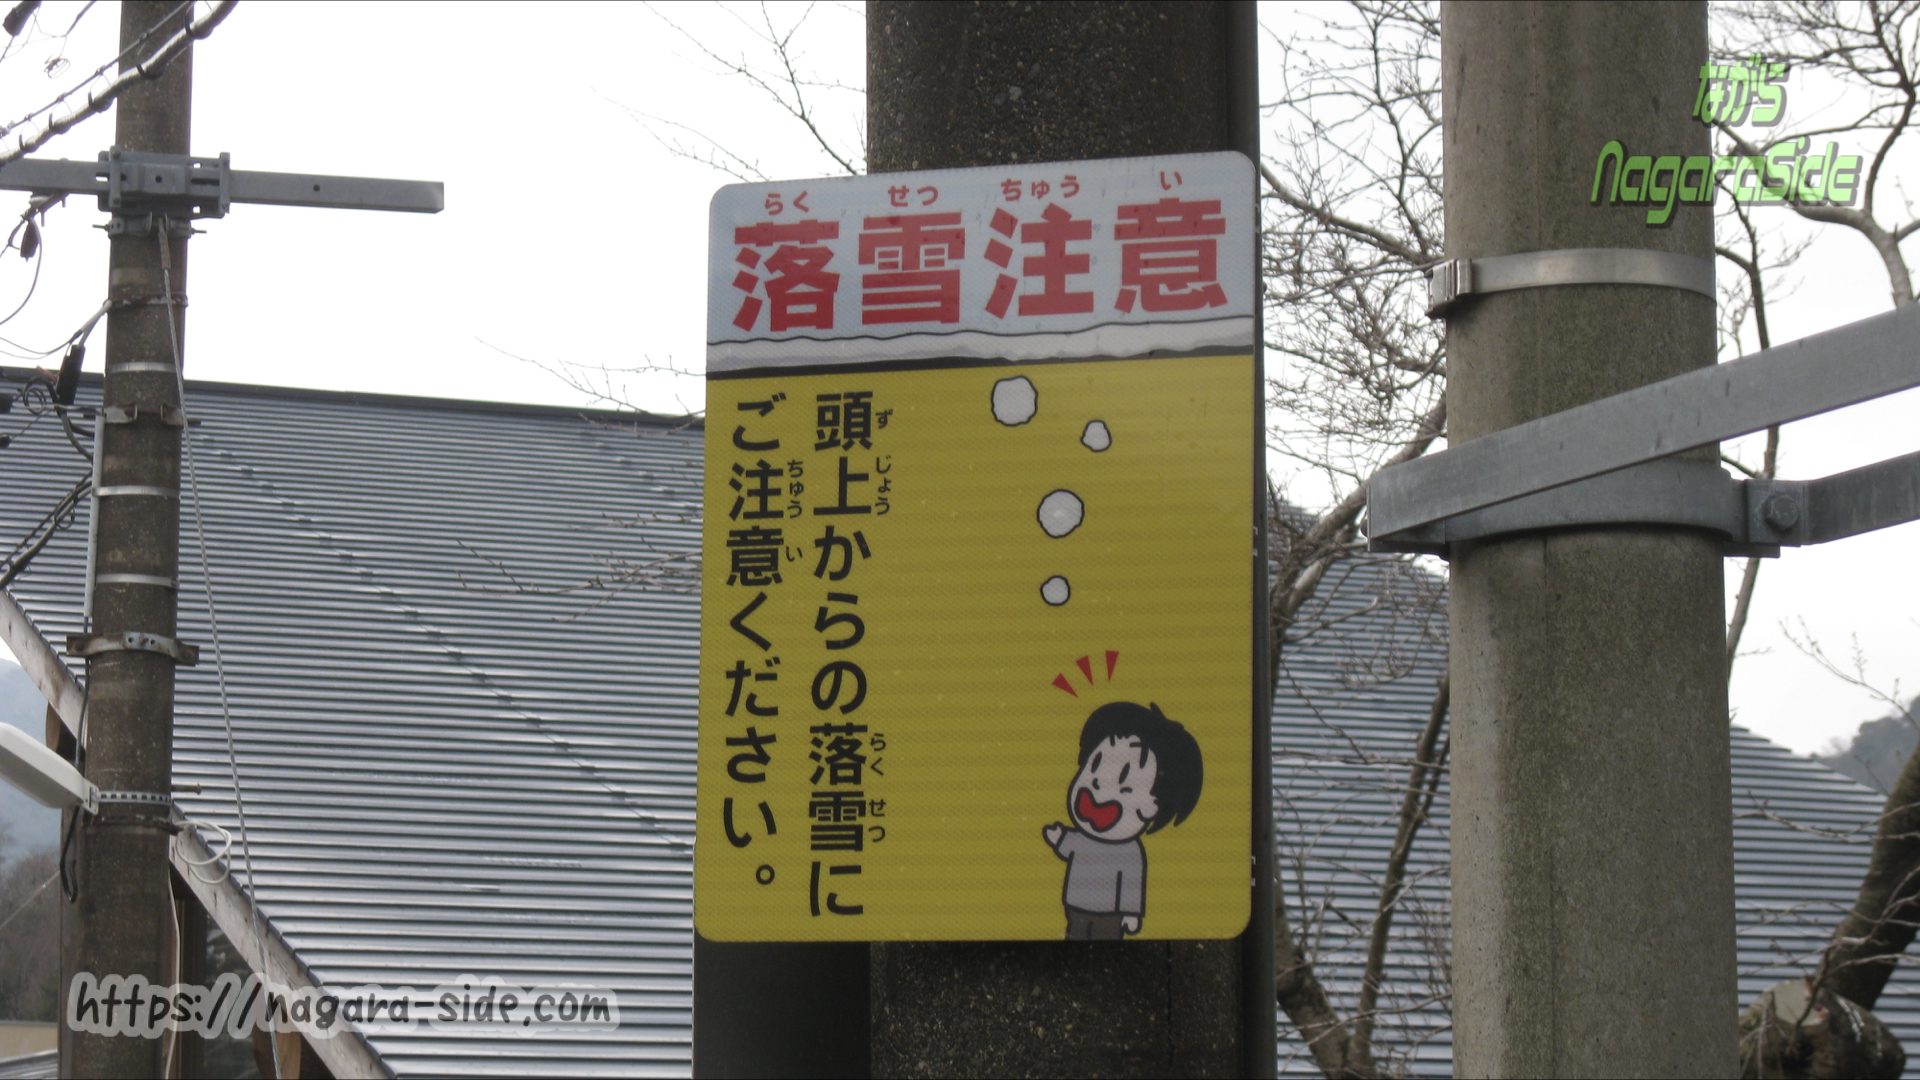 新疋田駅の落雪注意看板